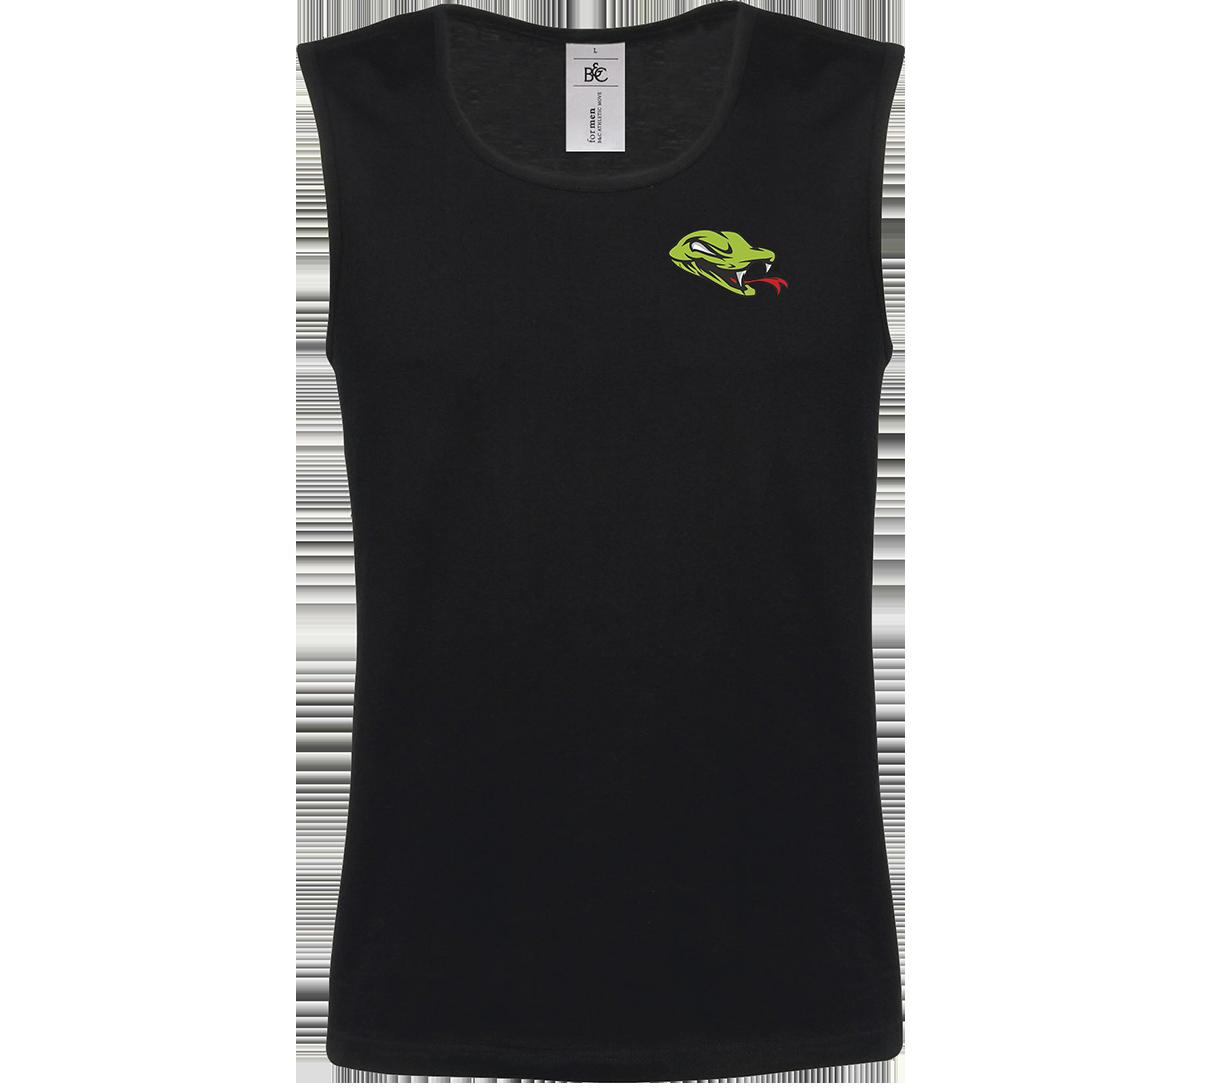 reputable site bfebf 2a527 Ärmelloses Shirt – Logo - Wesseling